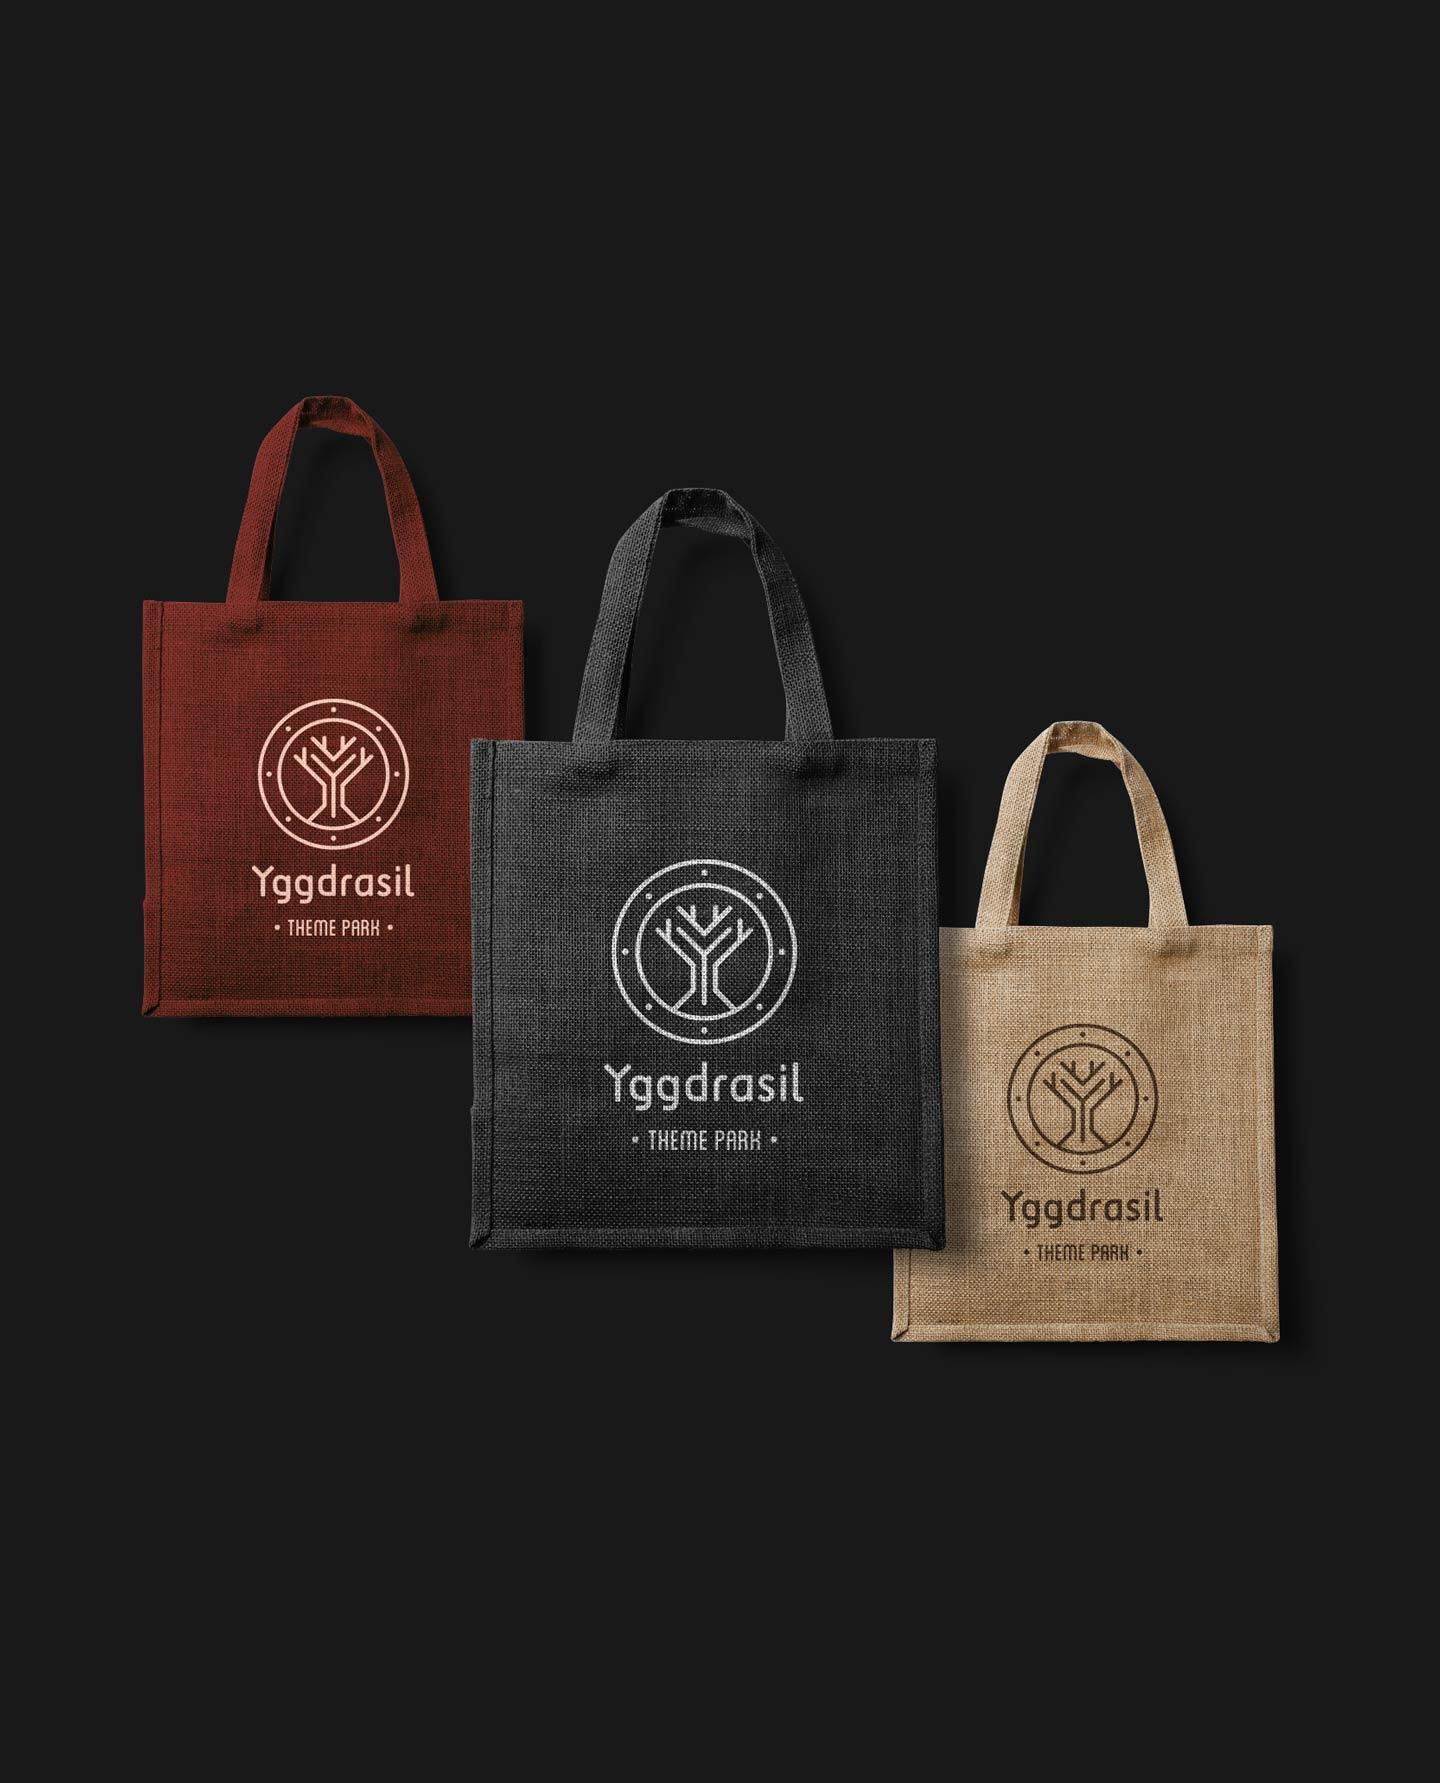 yggdrasil_bags-1